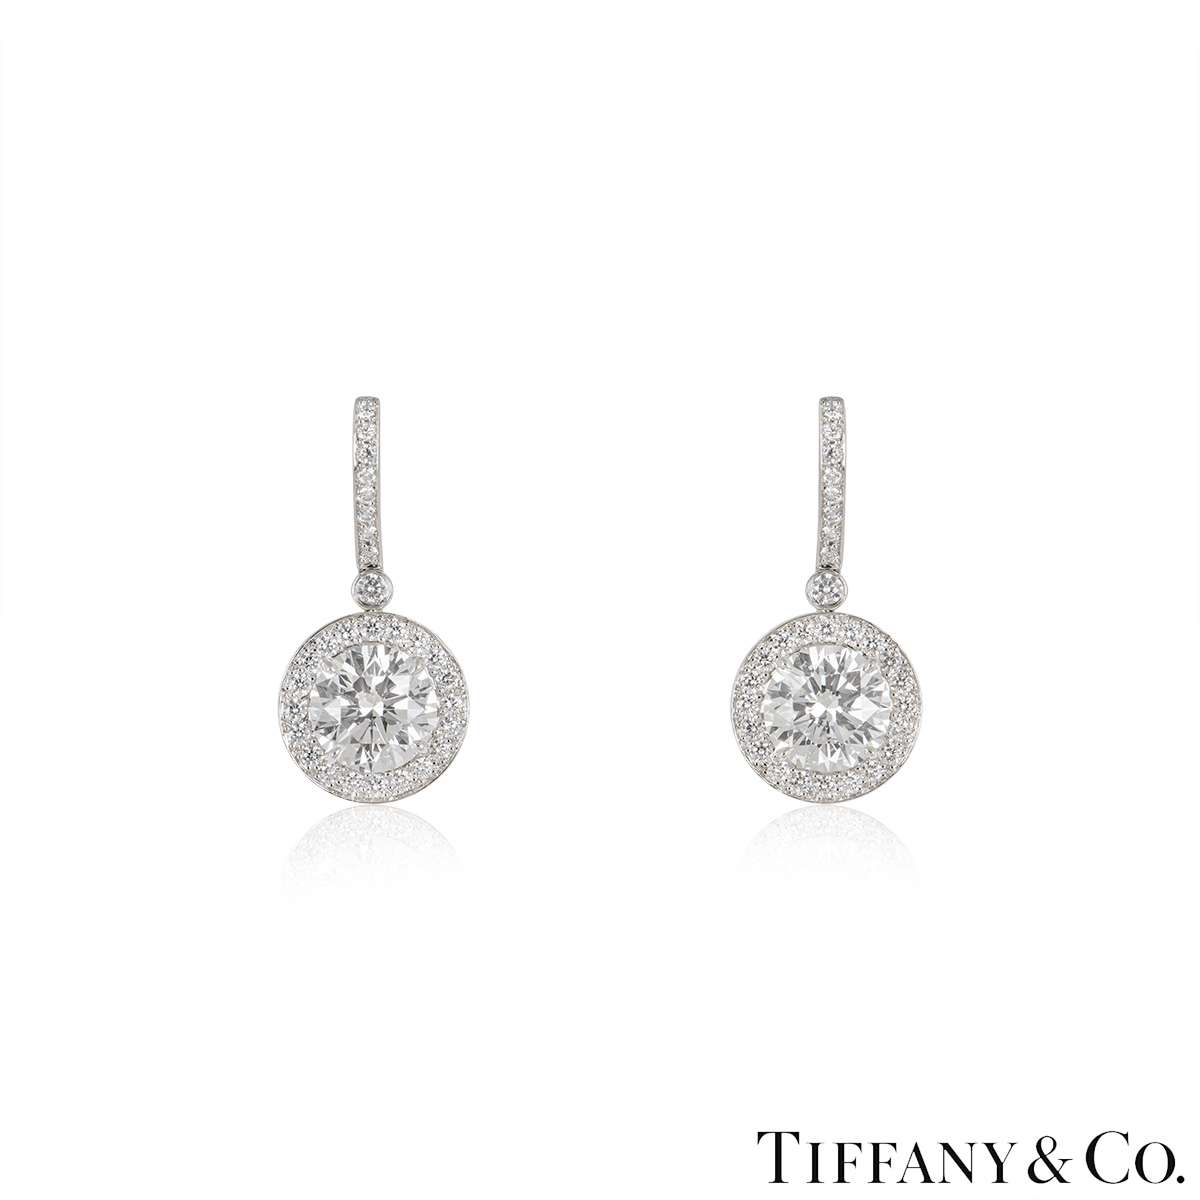 Tiffany & Co. Platinum Diamond Earrings 3.03ct TDW